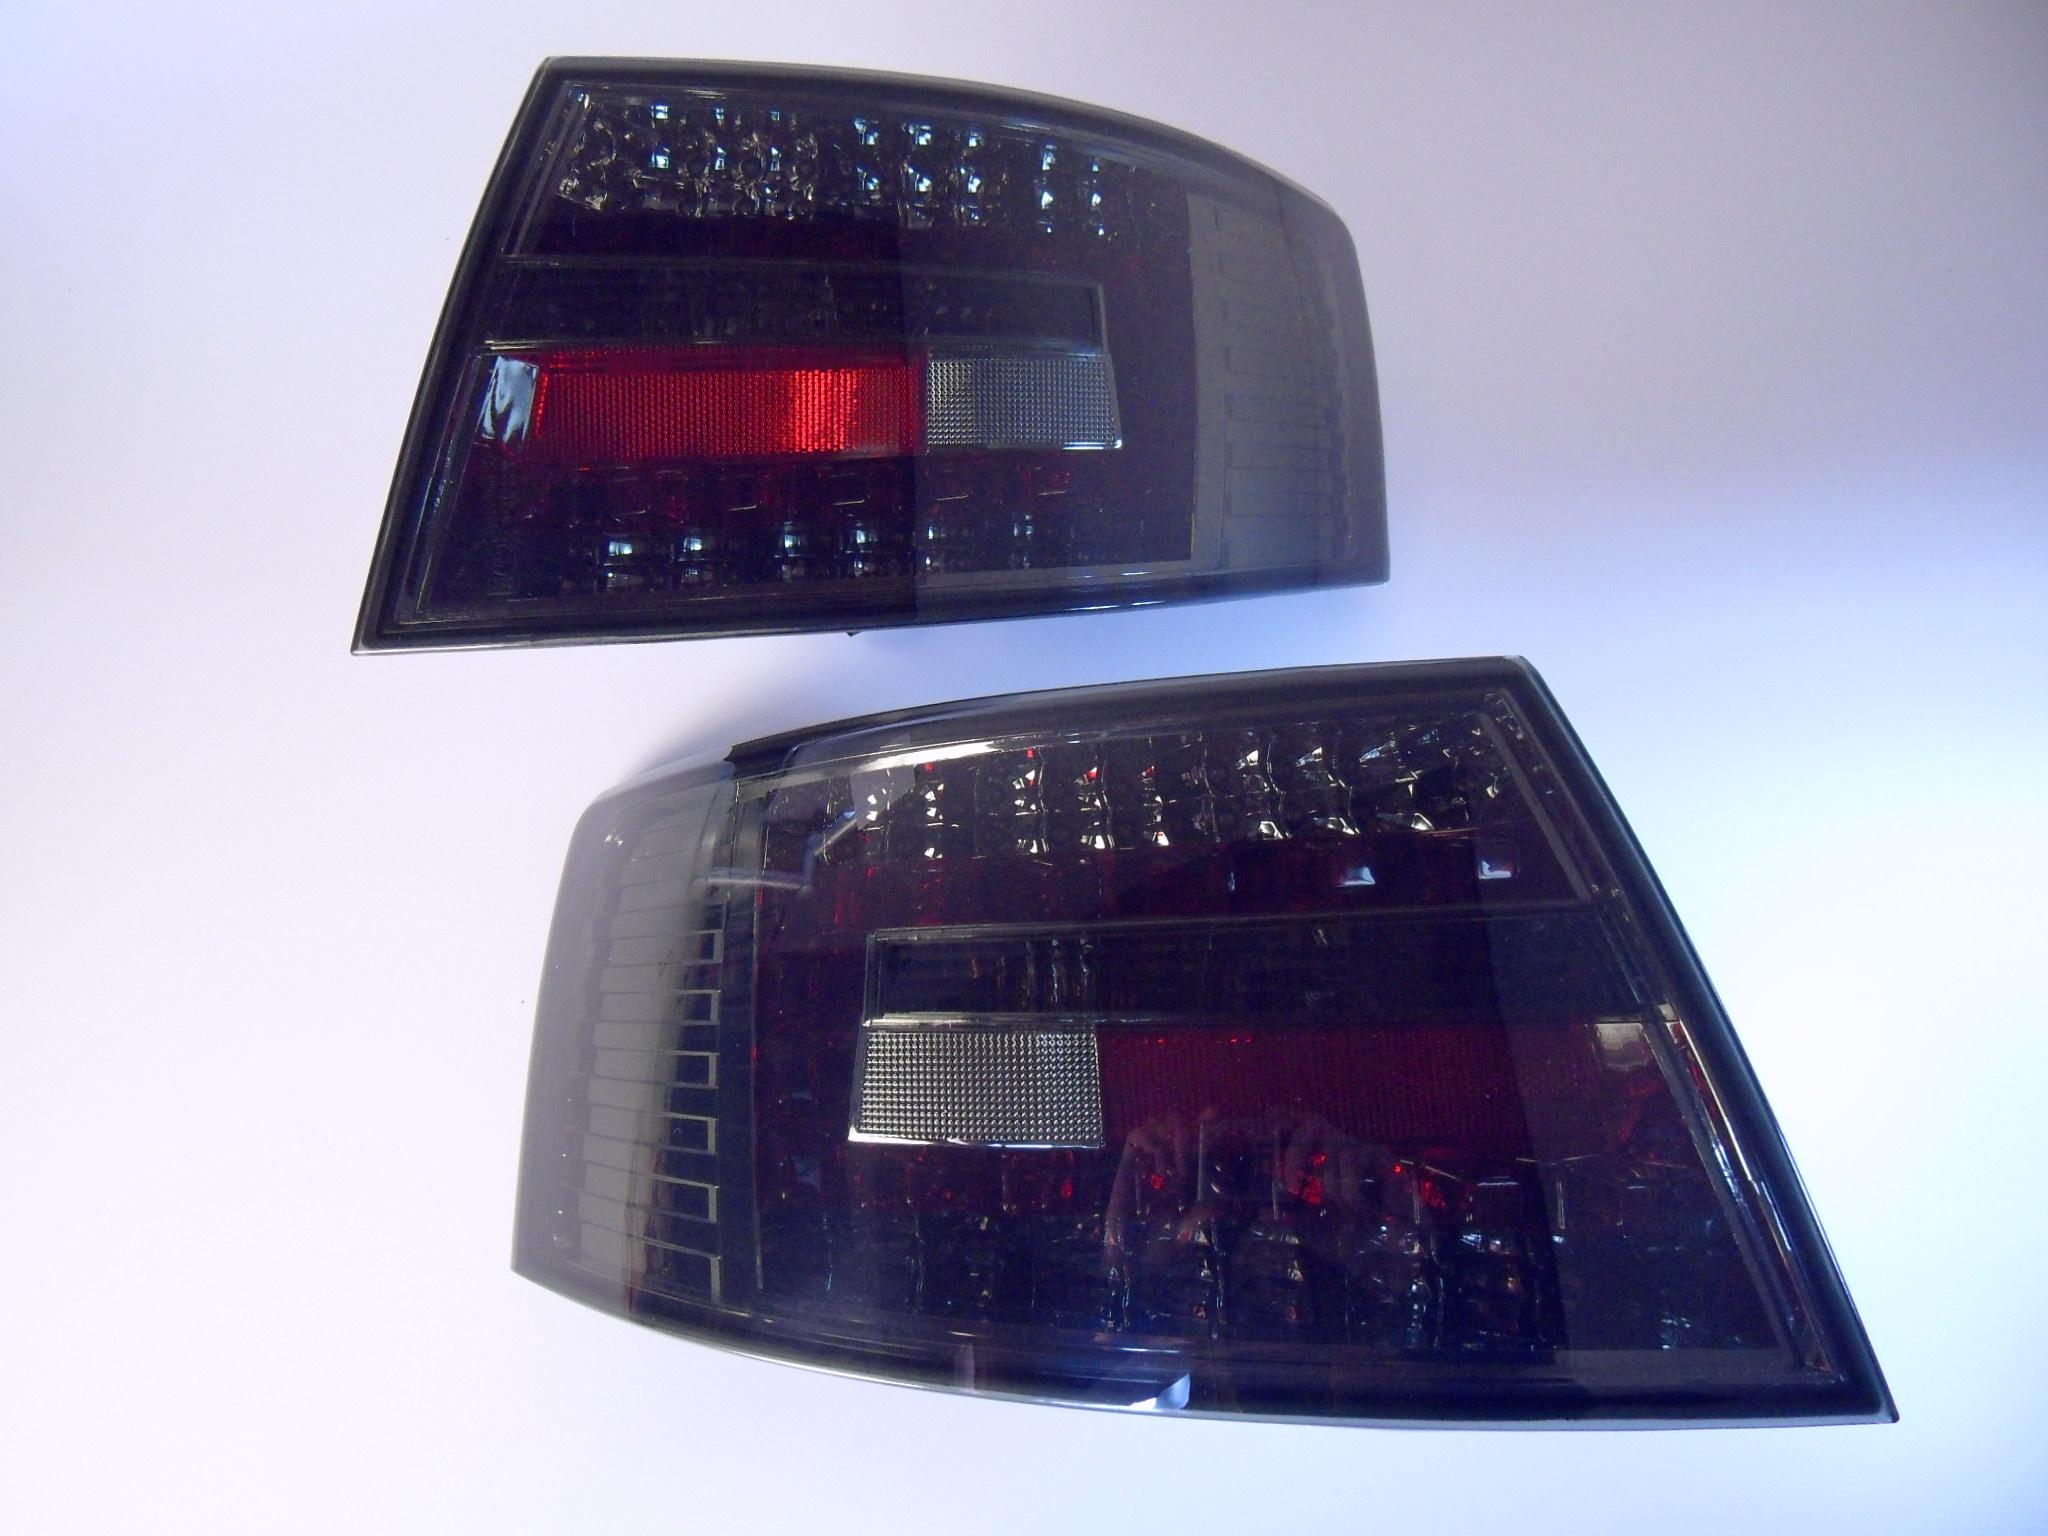 led r ckleuchten audi a6 4f limousine schwarz rauch glas. Black Bedroom Furniture Sets. Home Design Ideas